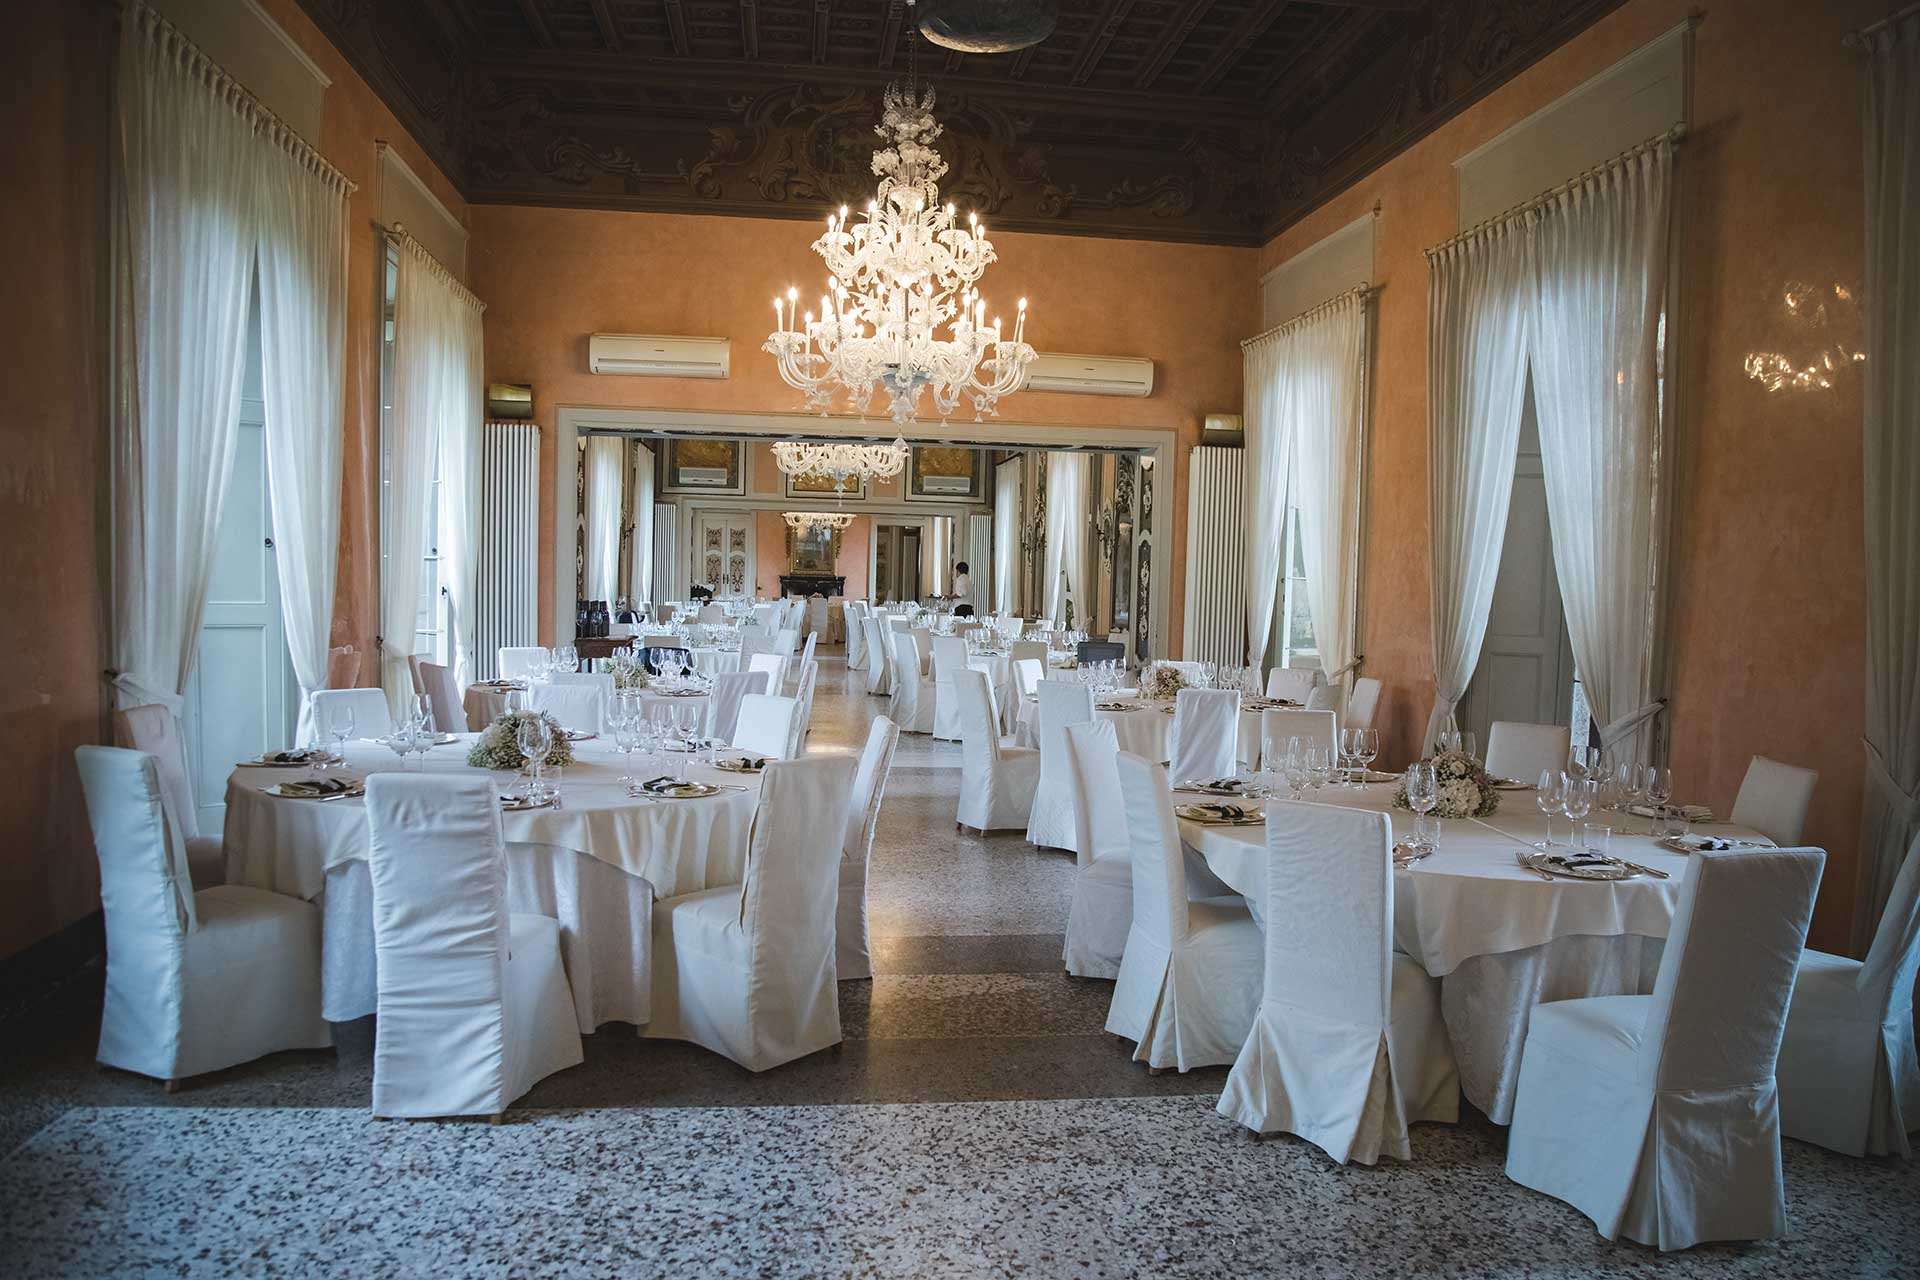 Villa Orsini Colonna interno salone ricevimento matrimonio tavoli